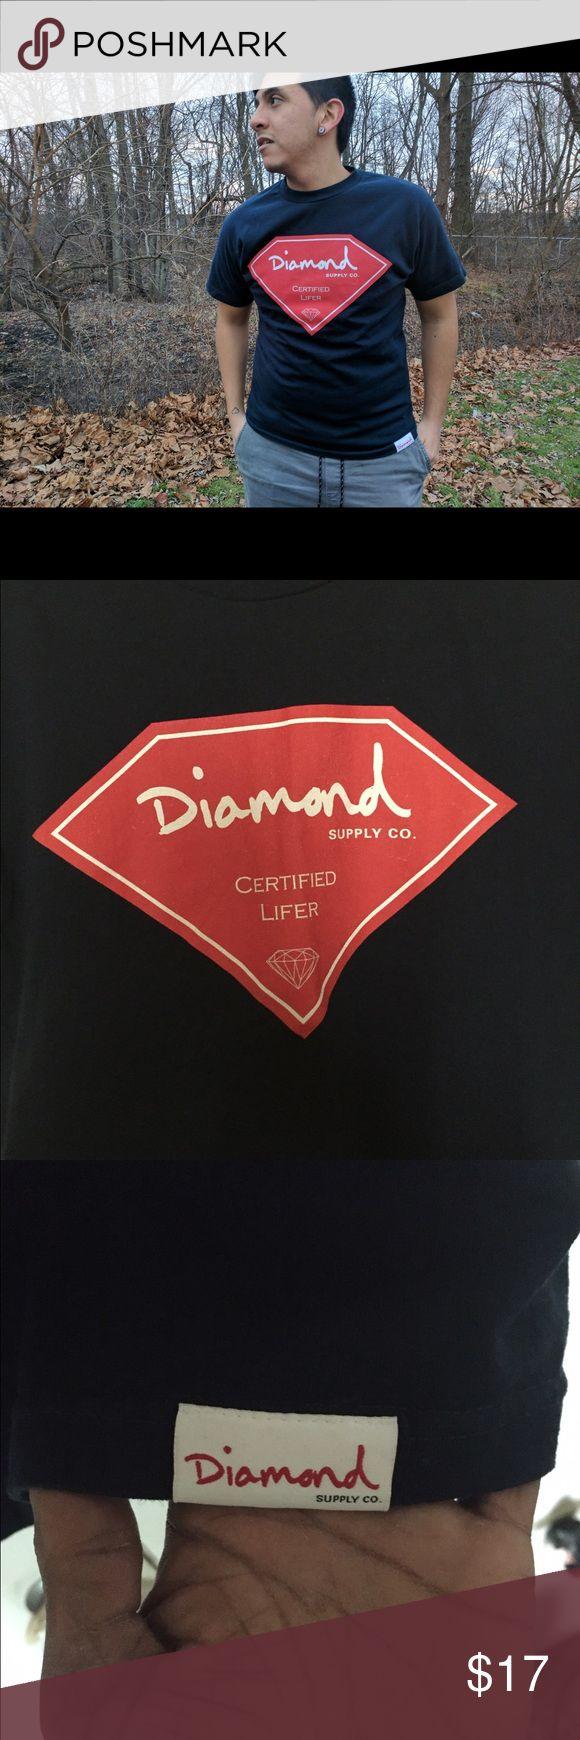 Fire Diamond supply company og Diamond supply company size medium og Diamond Supply Co. Shirts Tees - Short Sleeve